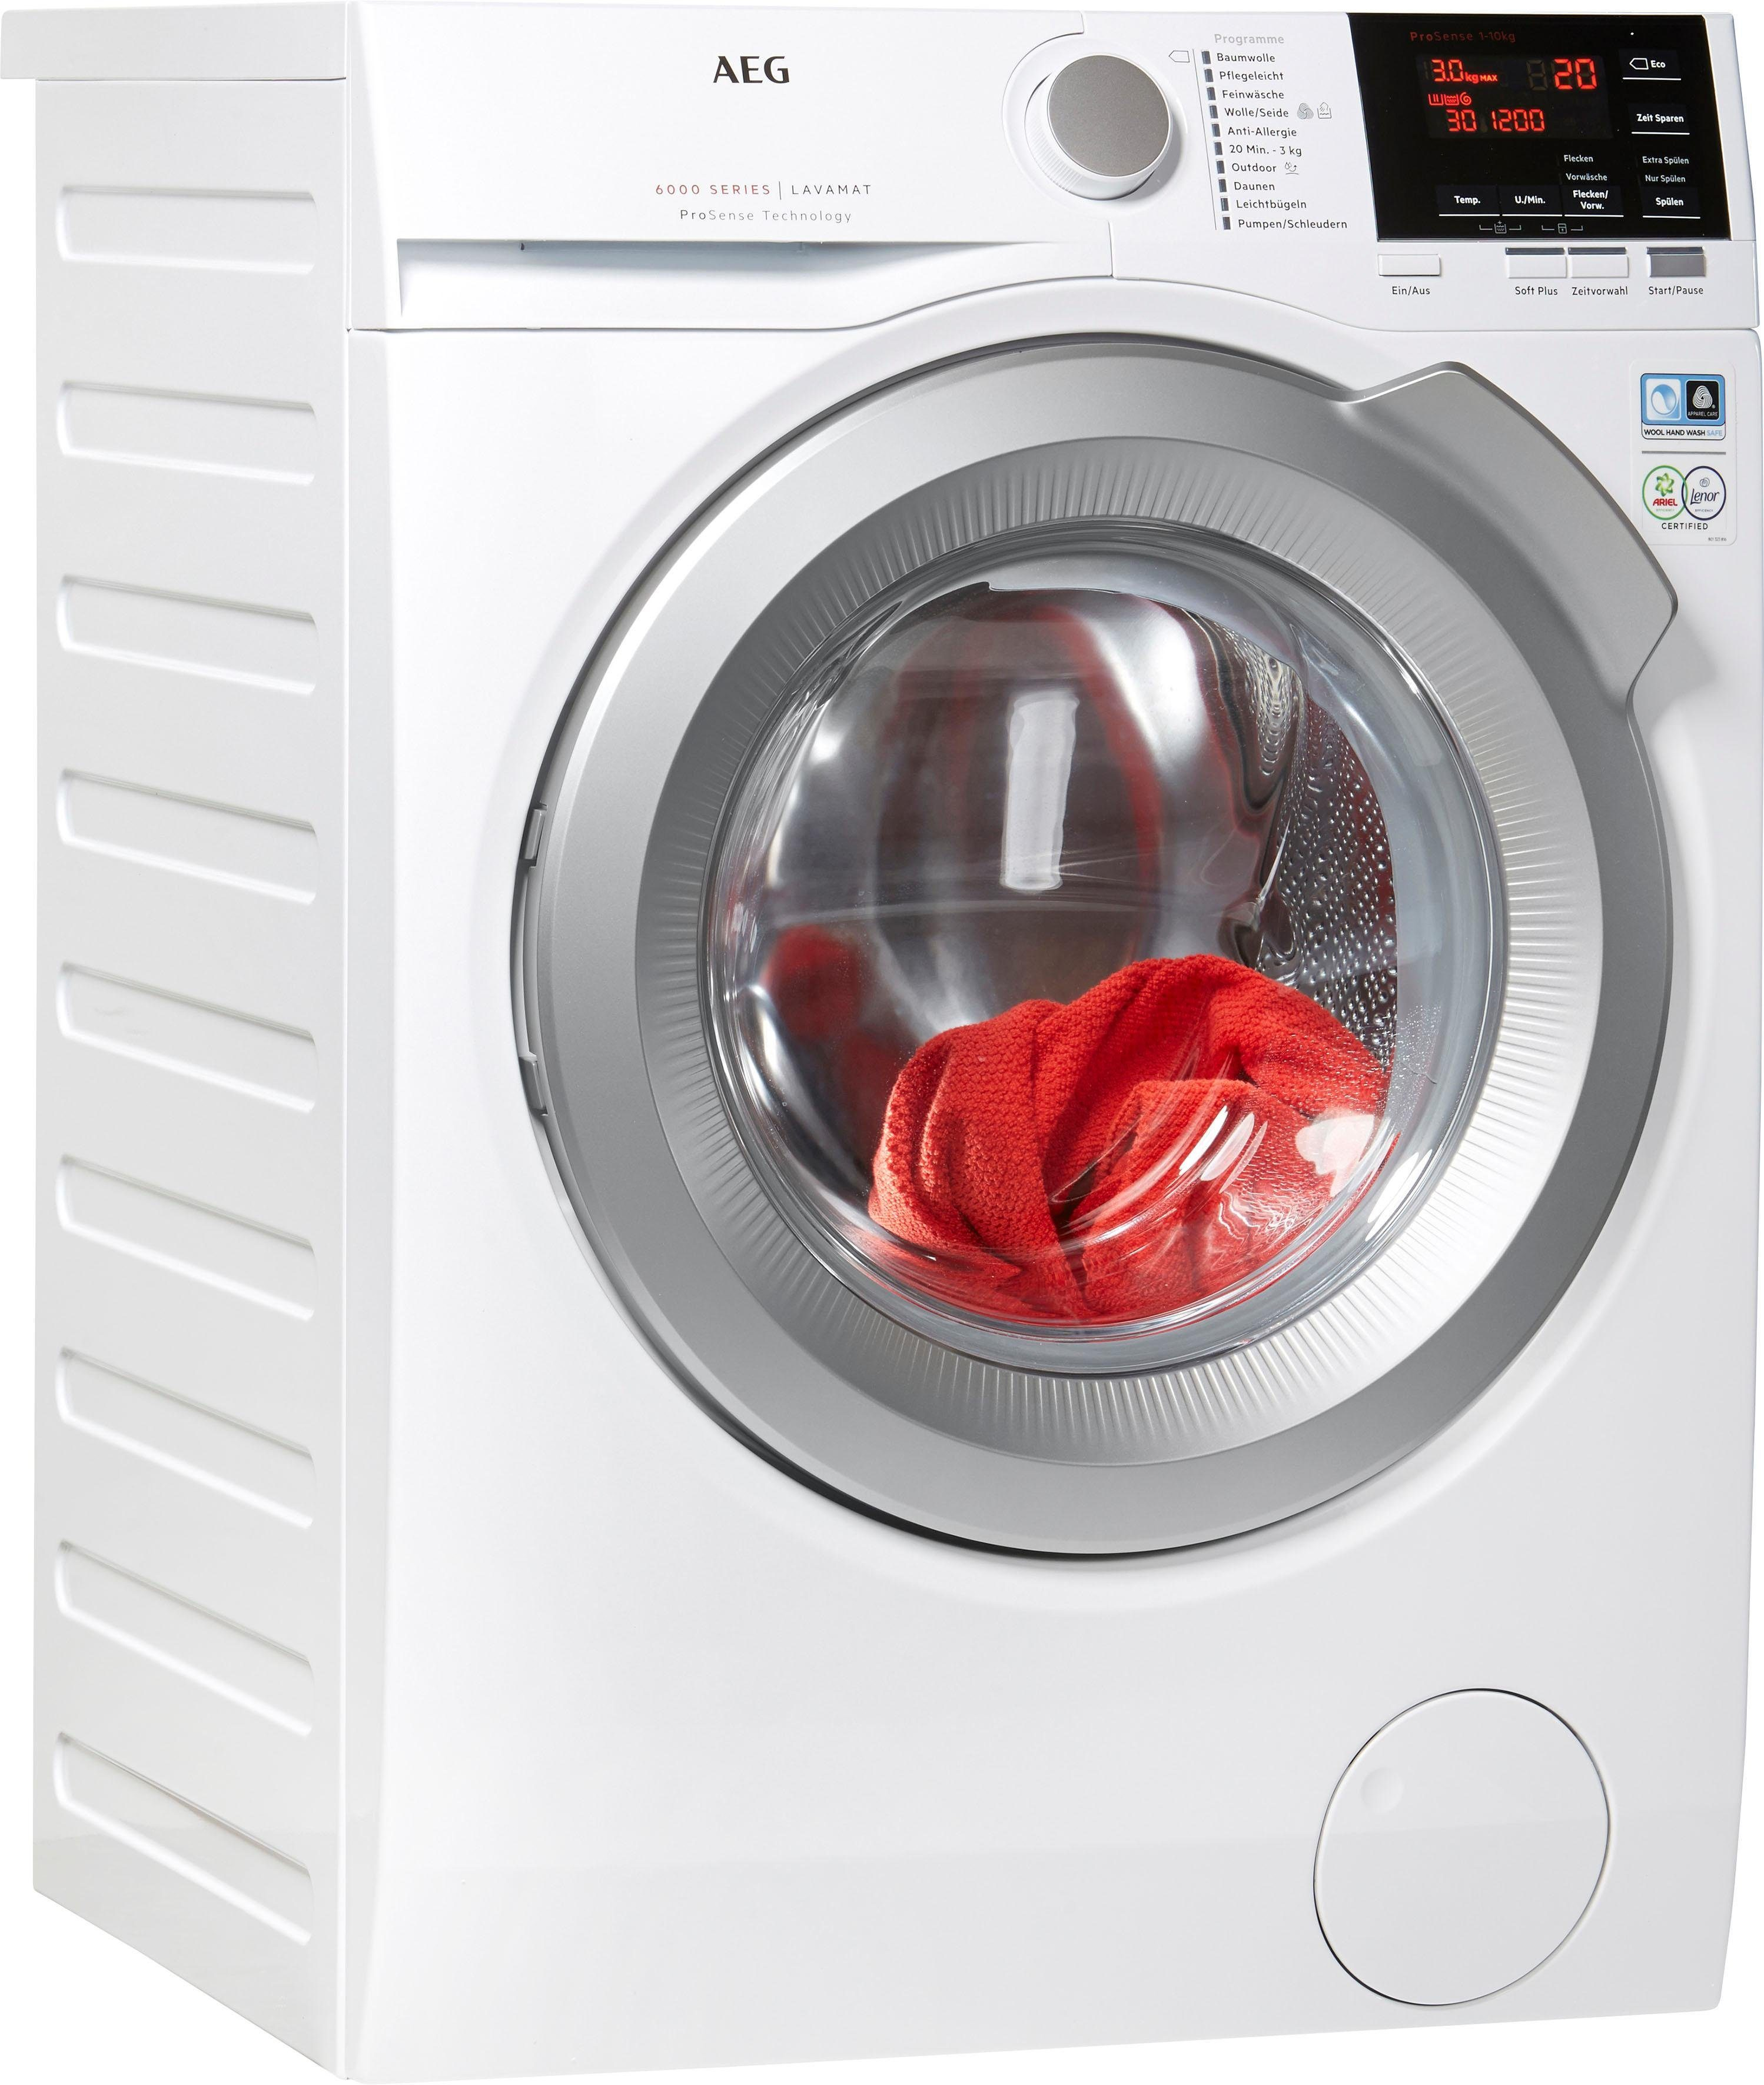 AEG Waschmaschine 6000 L6FB67400, 10 kg, 1400 U/Min